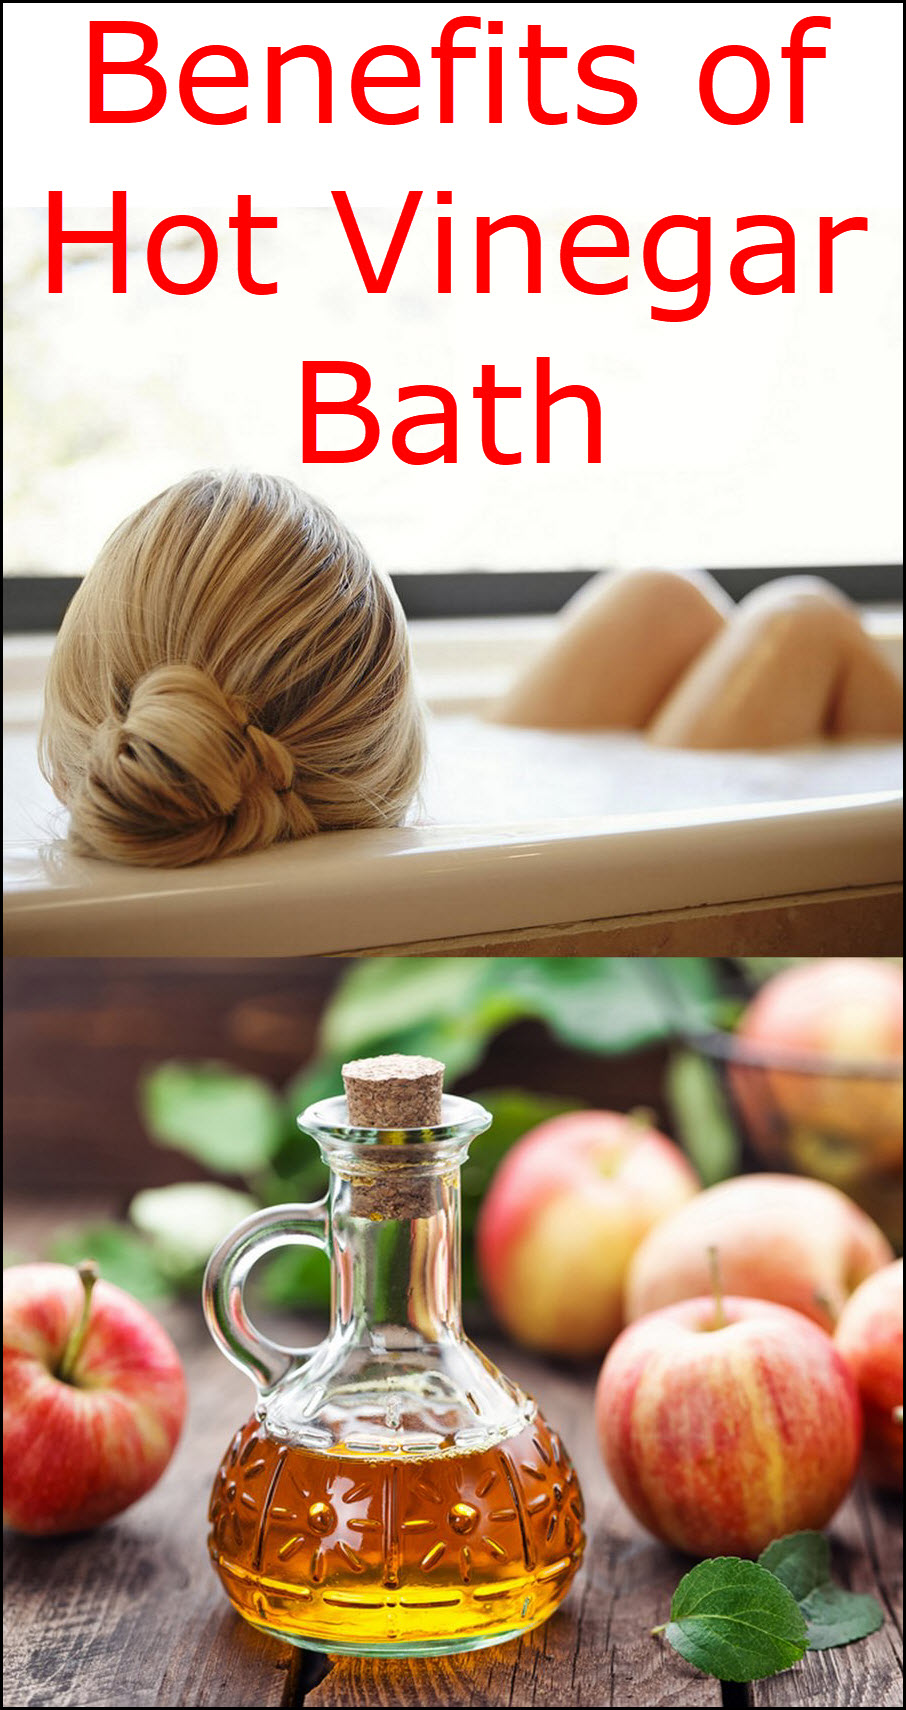 Benefits of Hot Vinegar Bath